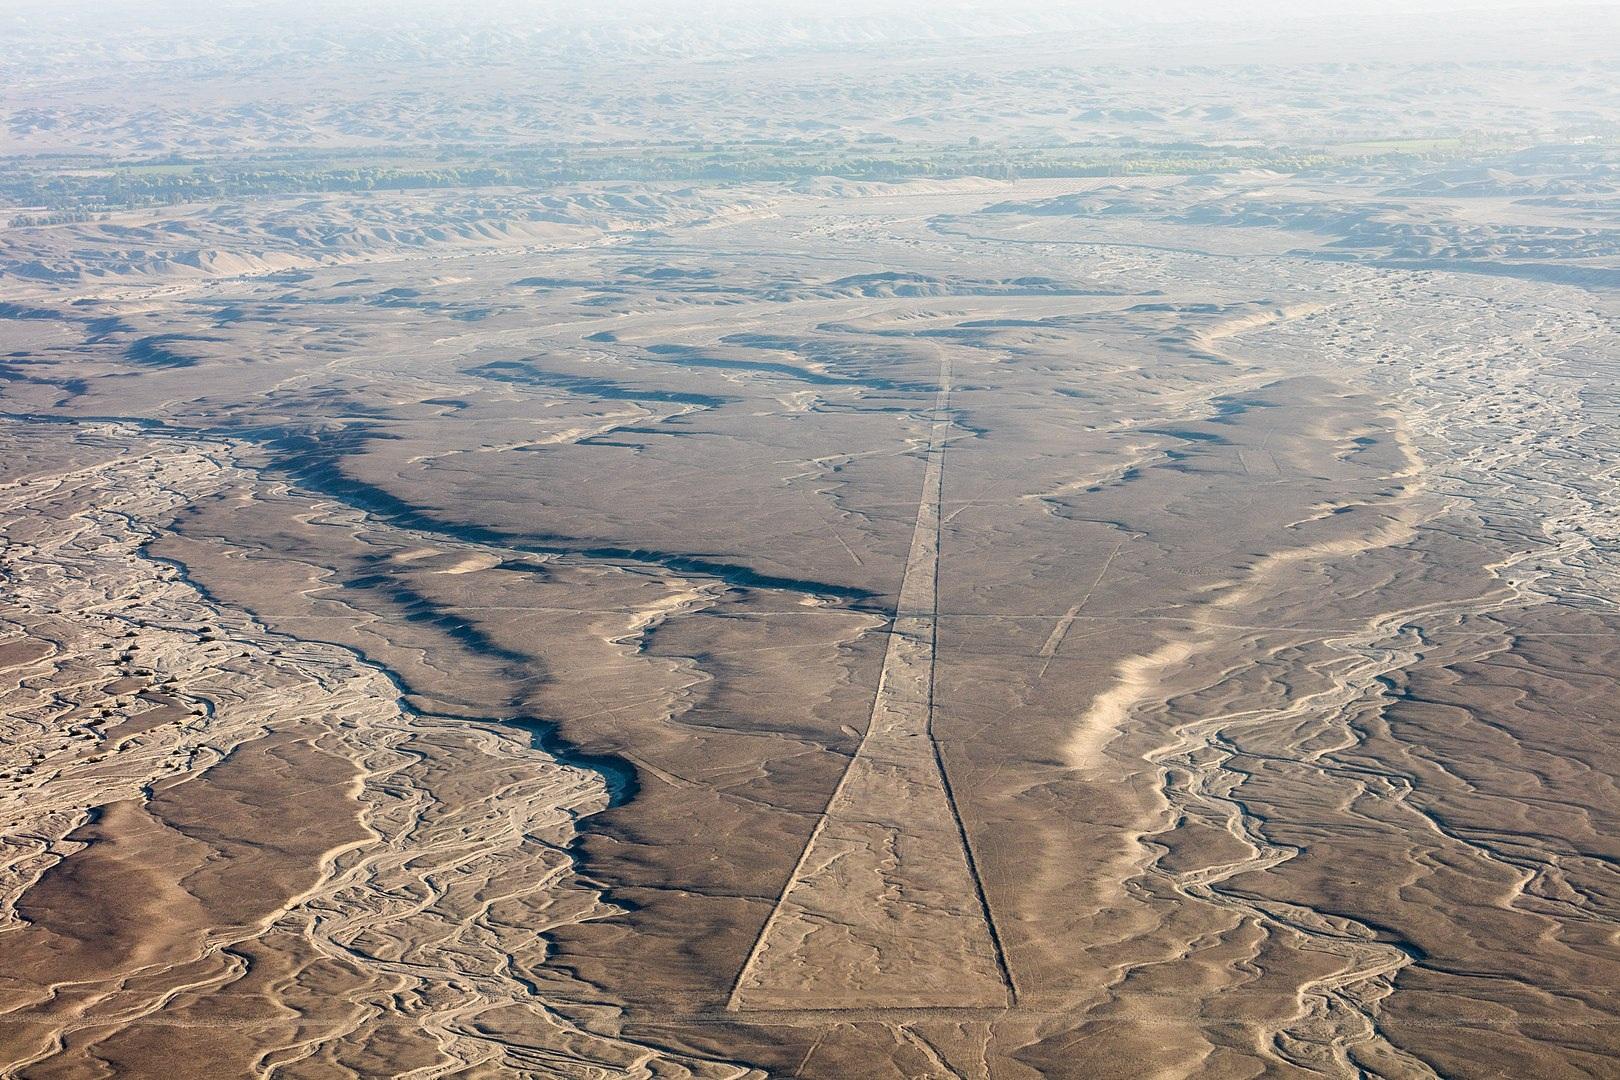 Nazca Lines and Nazca Valley